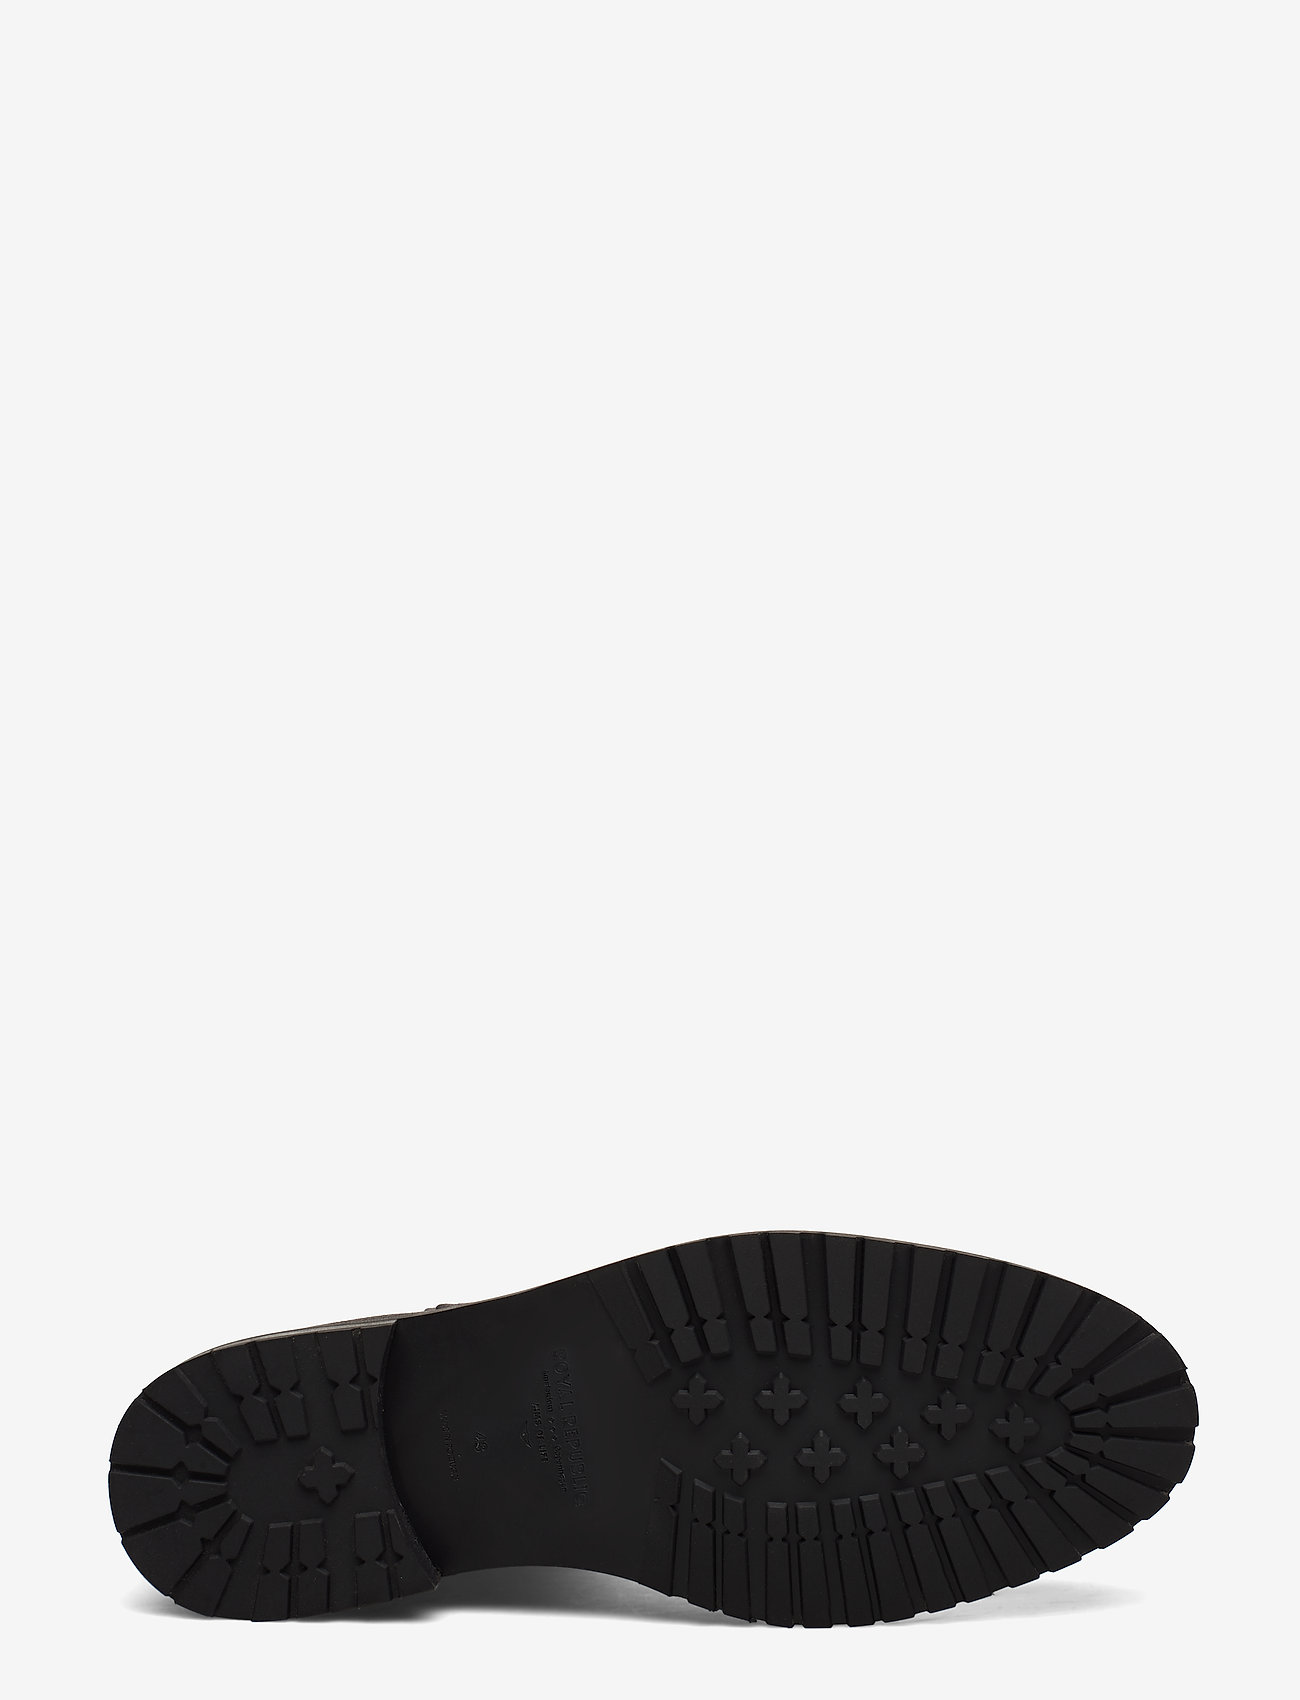 Alias City Hiker Derby Shoe (Black) - Royal RepubliQ